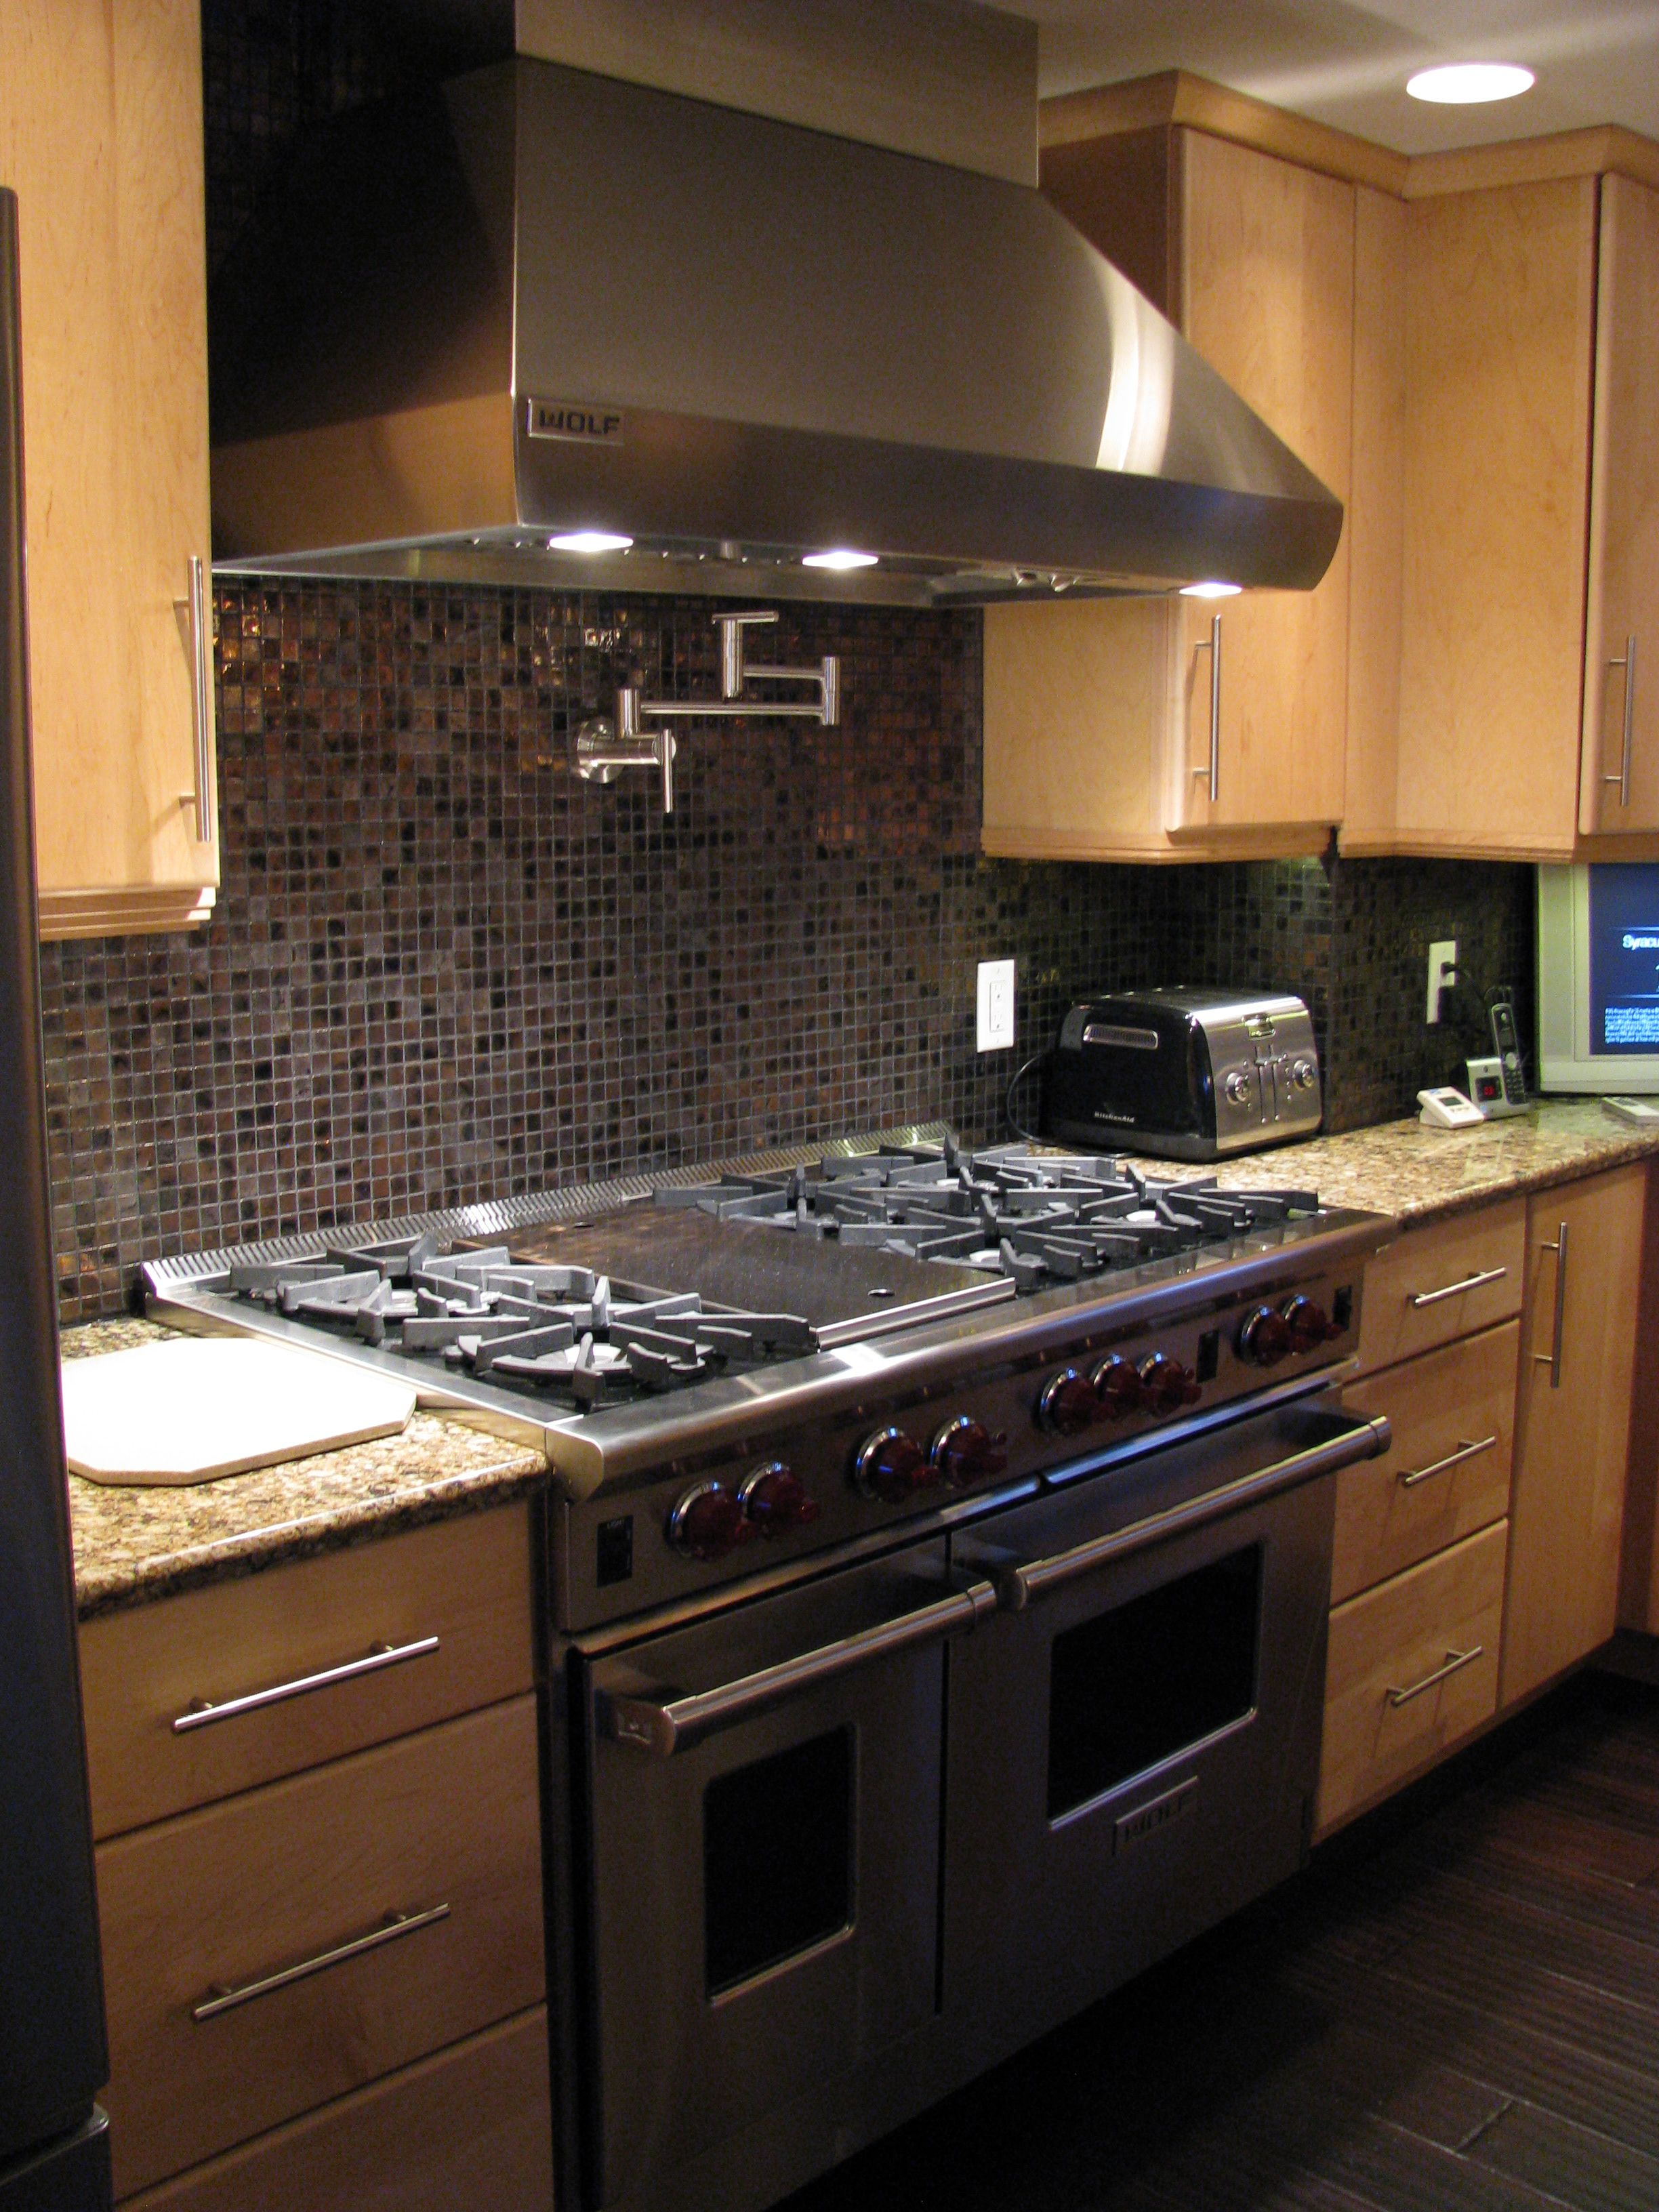 Commercial stove, glass tile, and a pot filler faucet | Allcraft ...